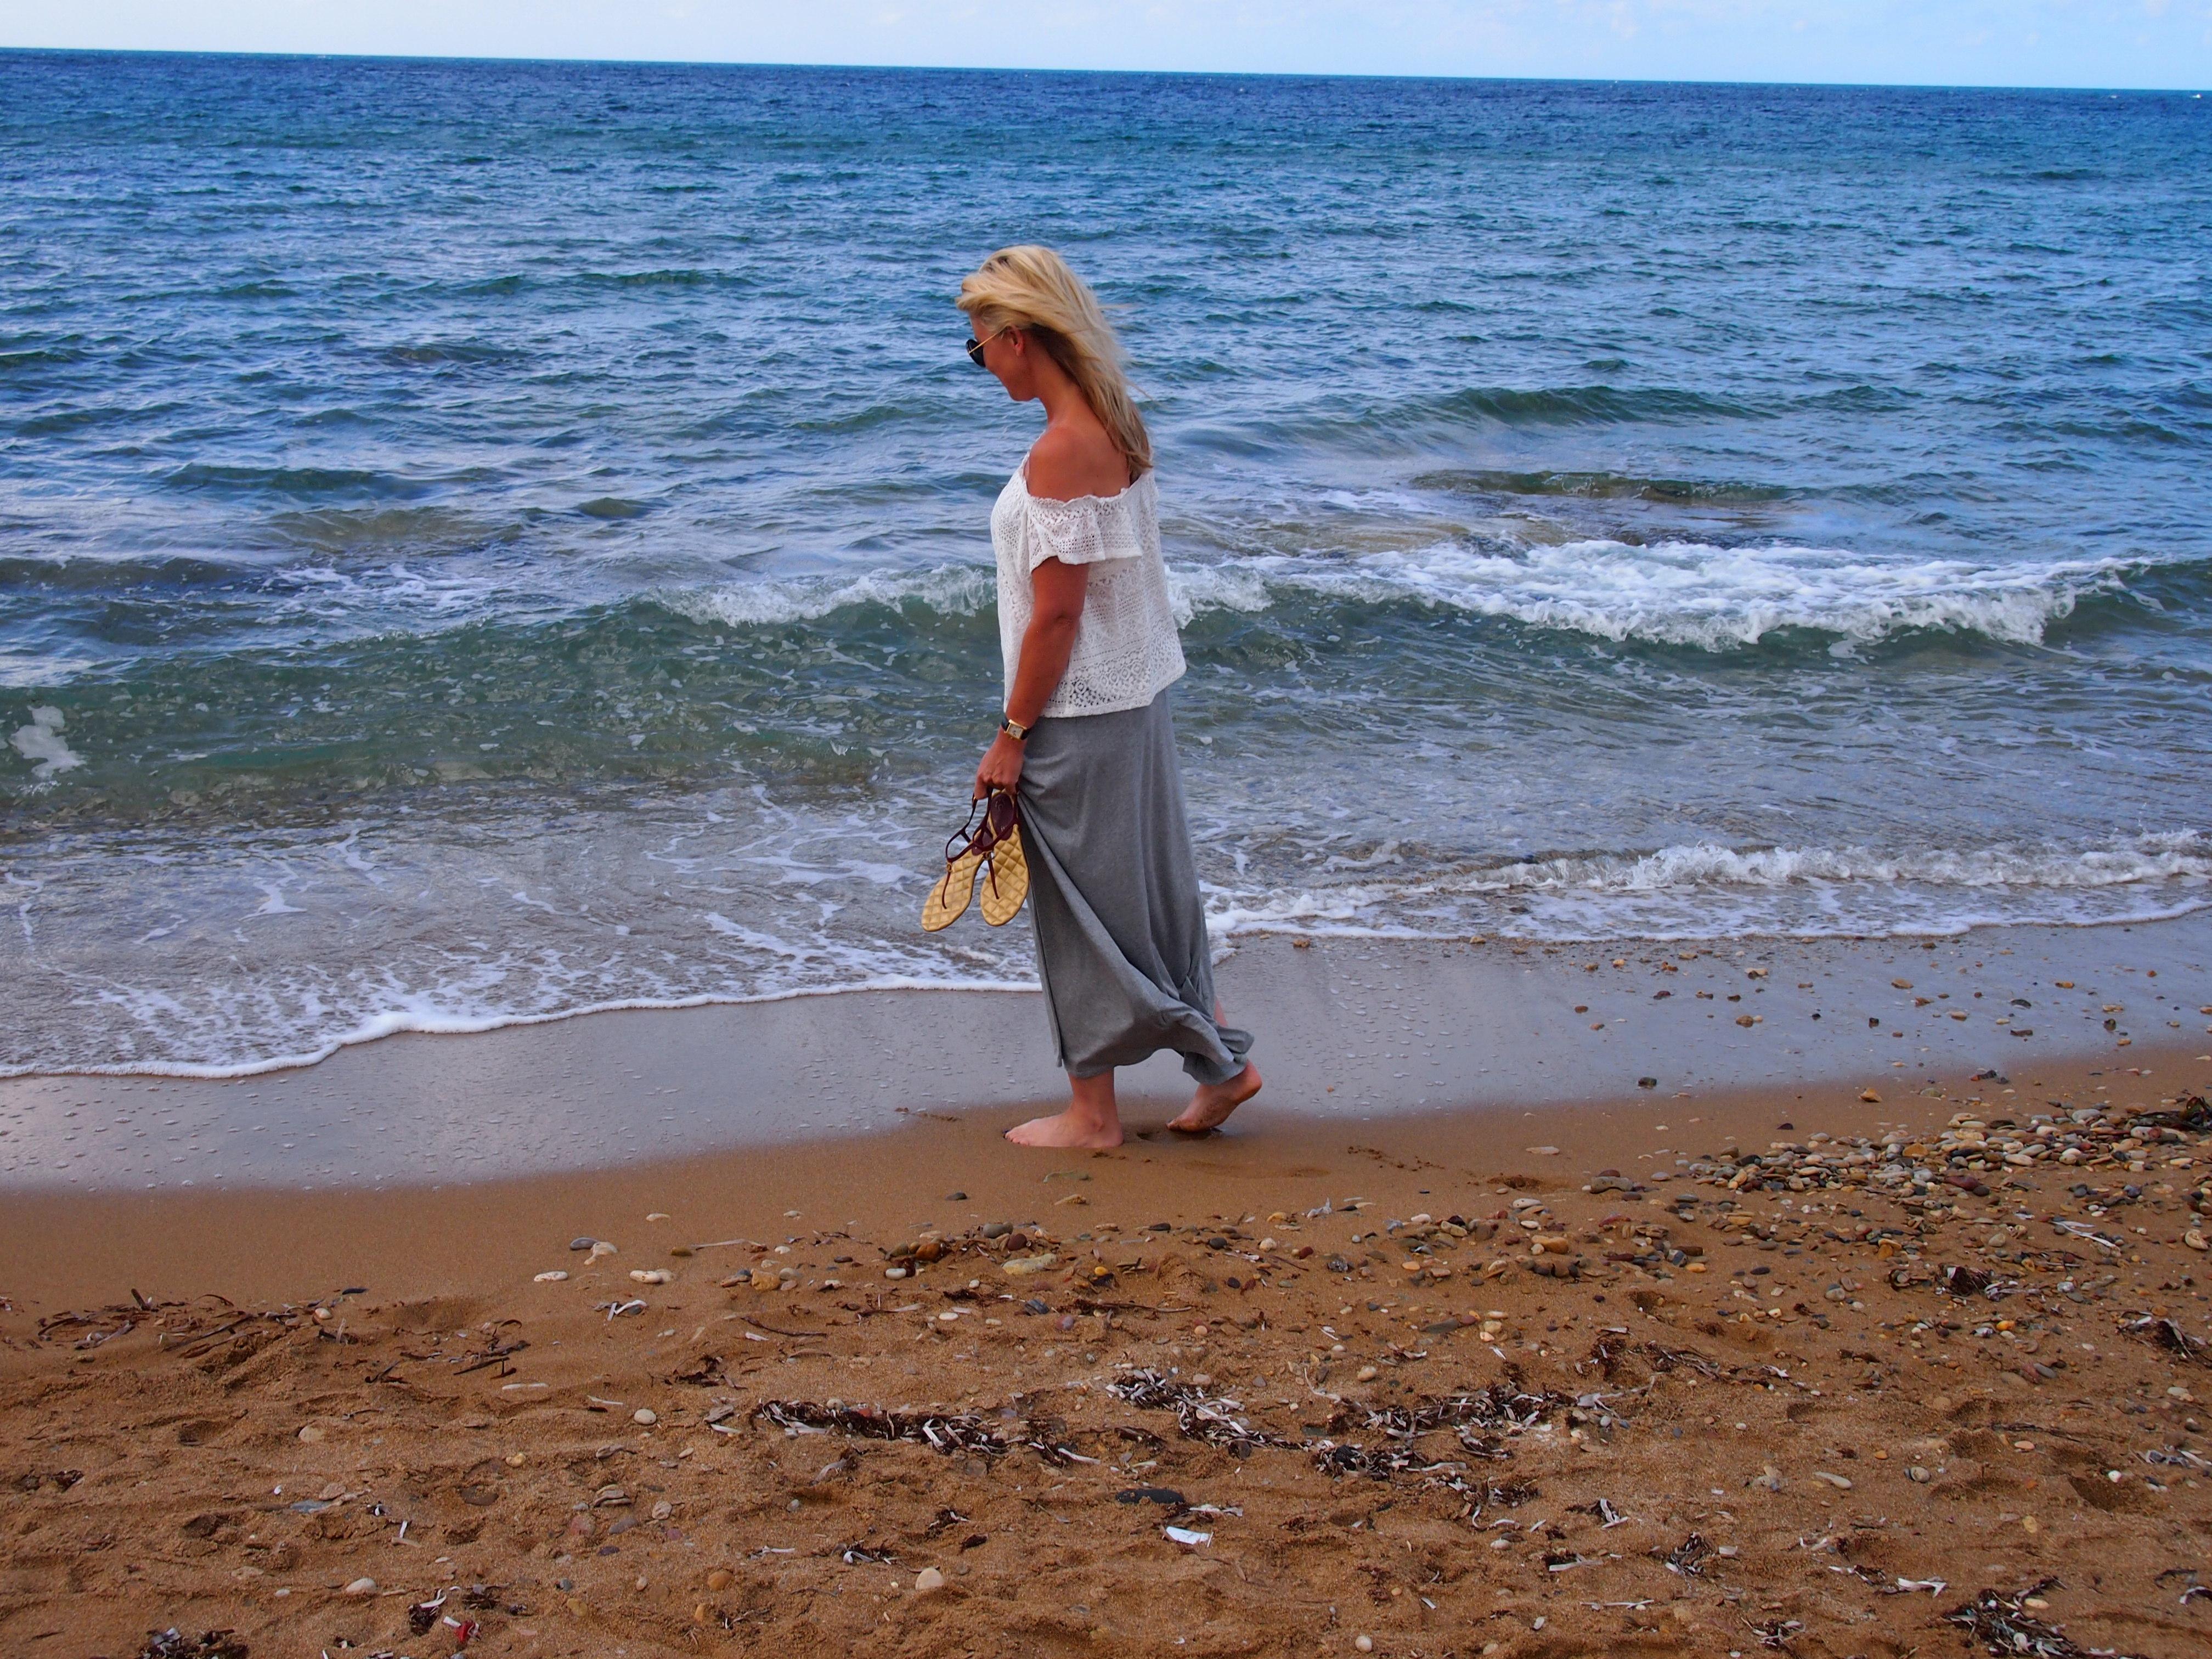 Reisdagboek Kreta deel 2